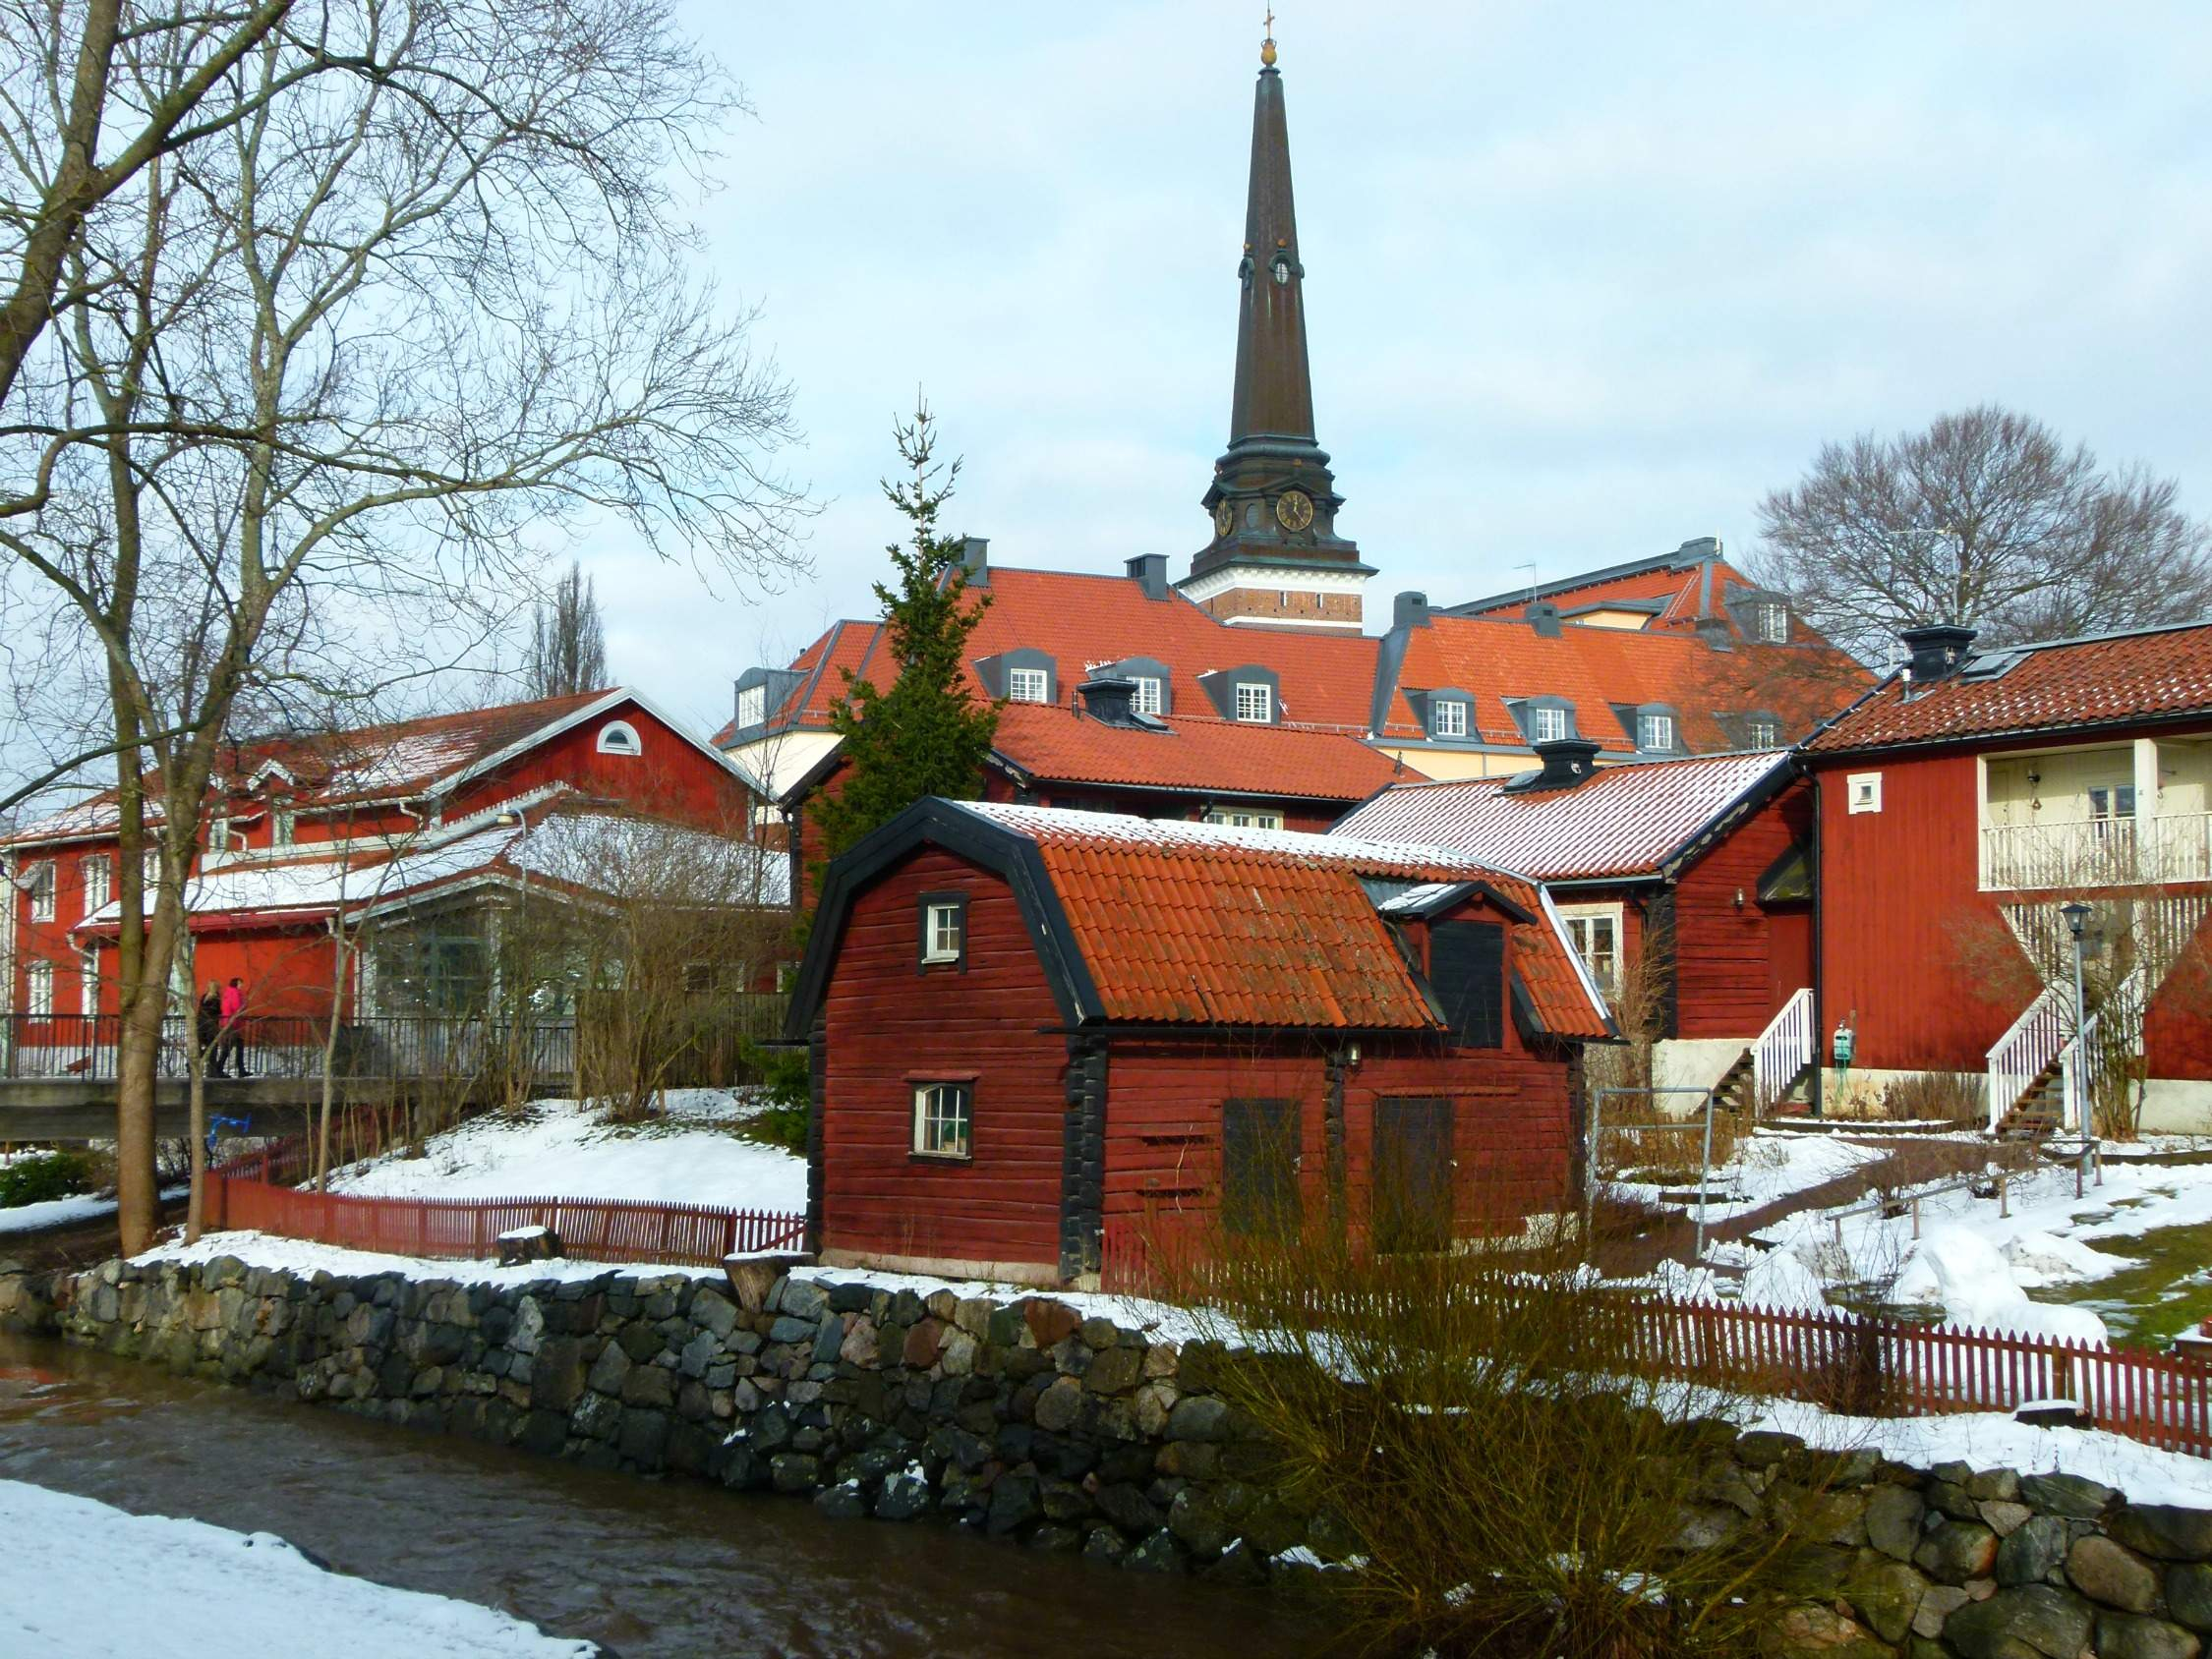 P1070738 560x420 - Experiencing Sweden in a Nutshell – A Visit to Västerås